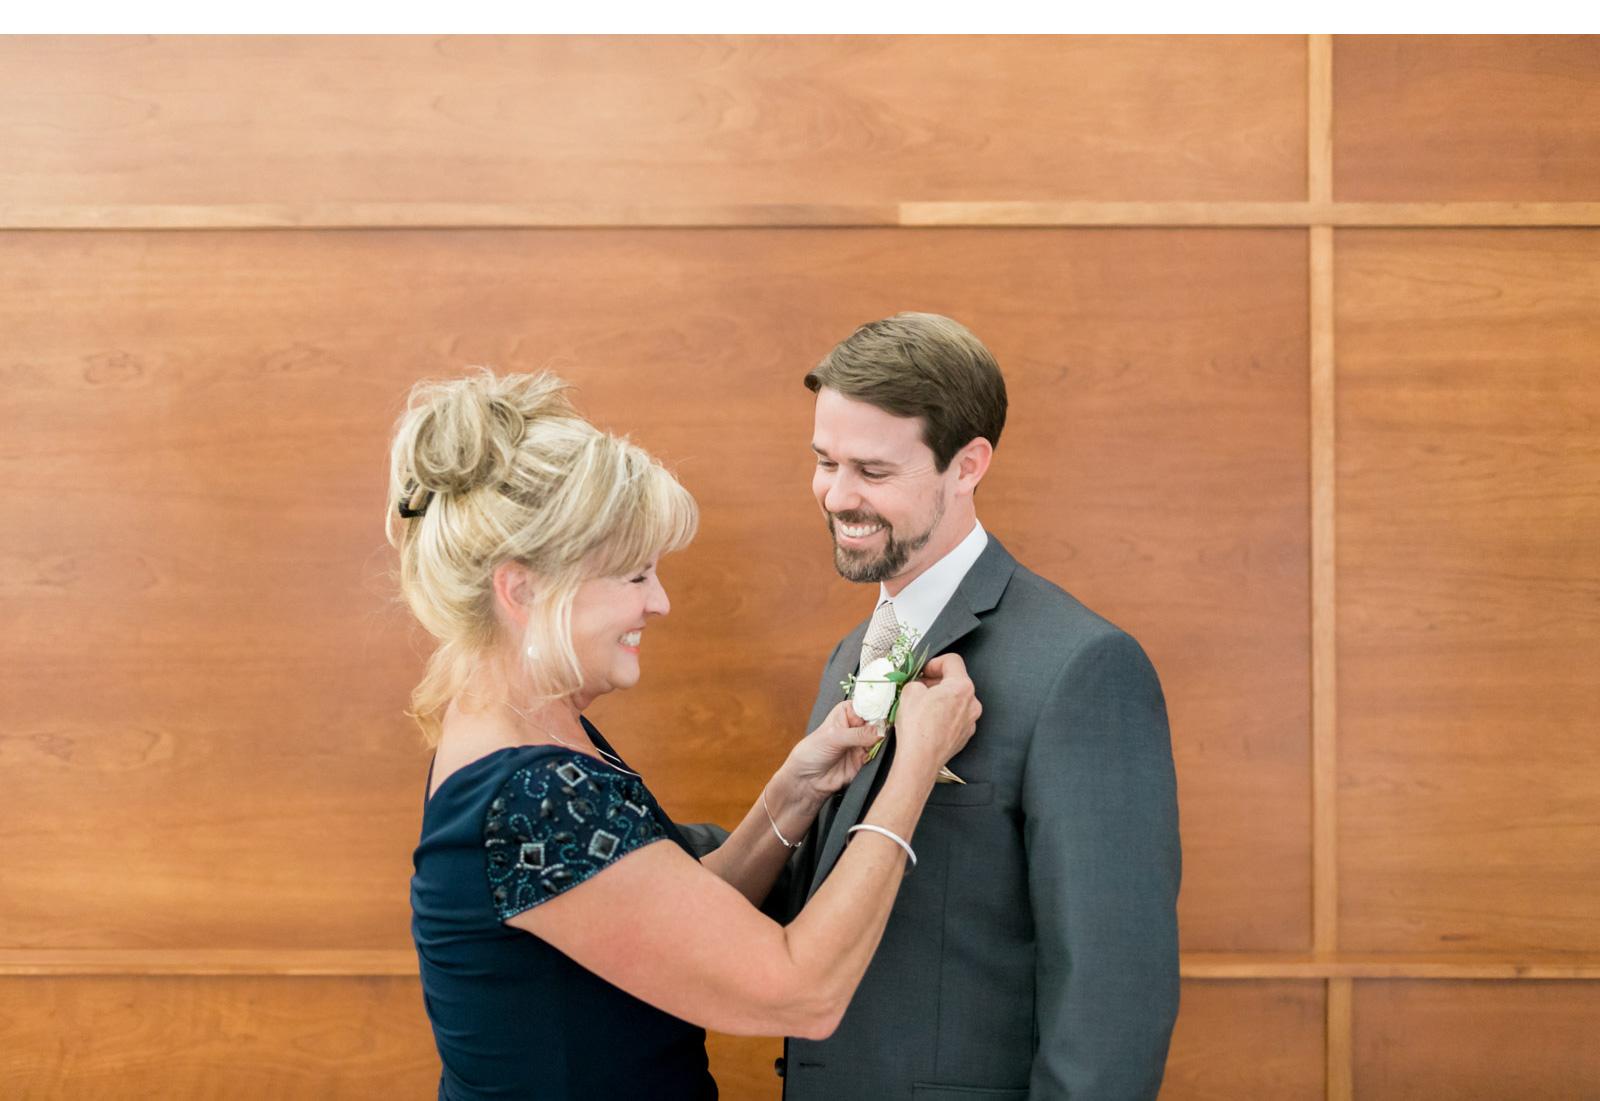 Los-Angeles-Wedding-Natalie-Schutt-Photography_03.jpg